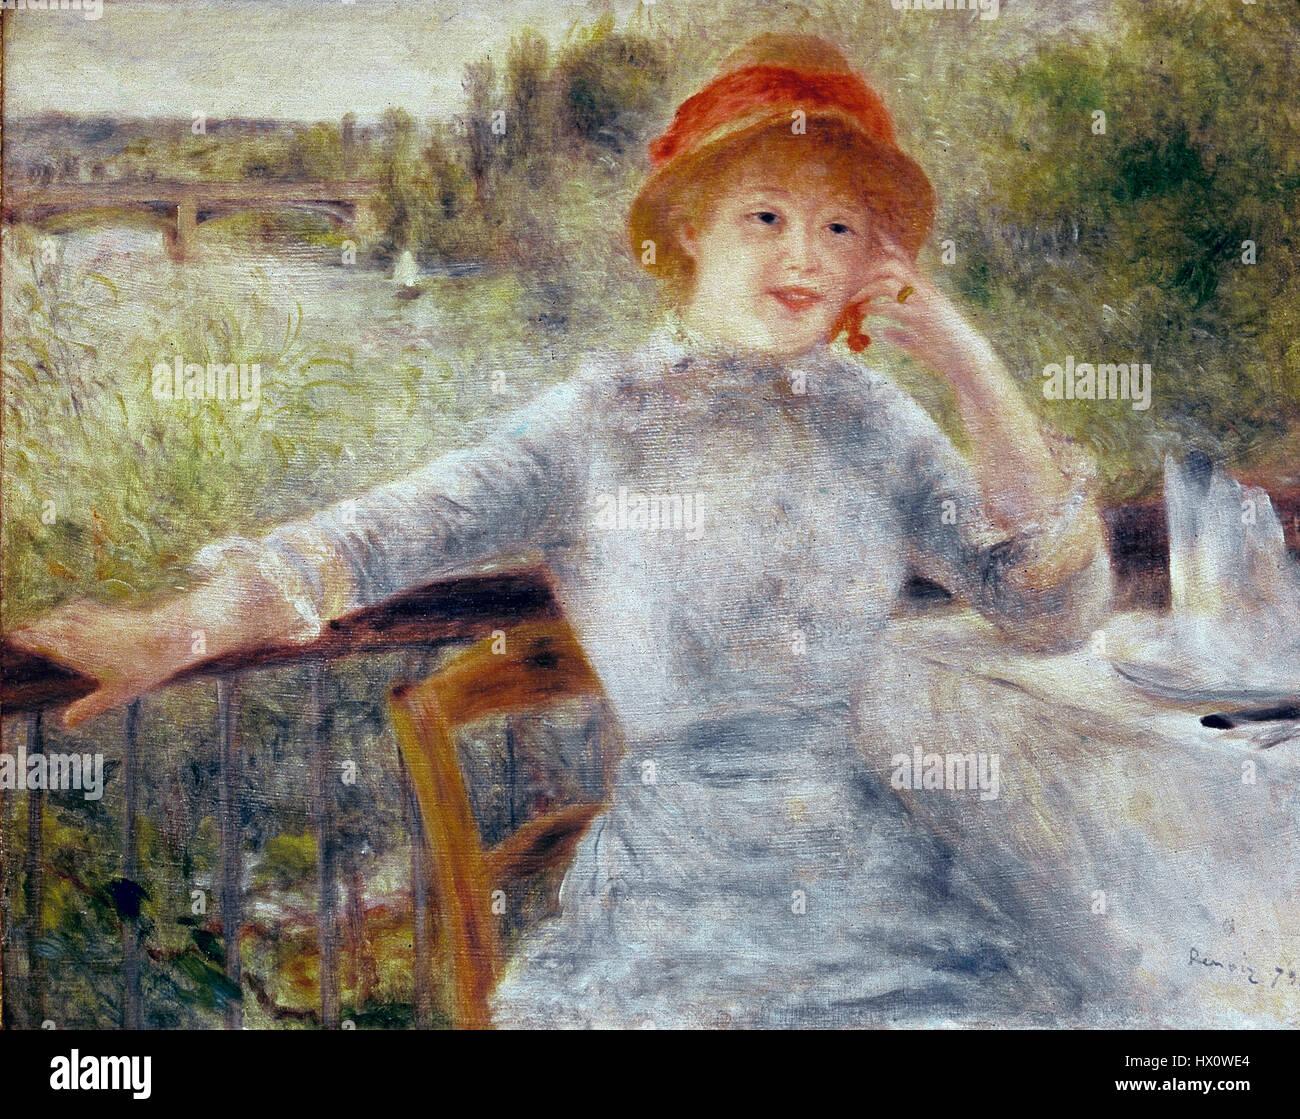 Auguste Renoir (1841-1919).  French painter. Impressionist. Portrait of Alphonsine Fournaise, 1879. Orsay Museum. - Stock Image